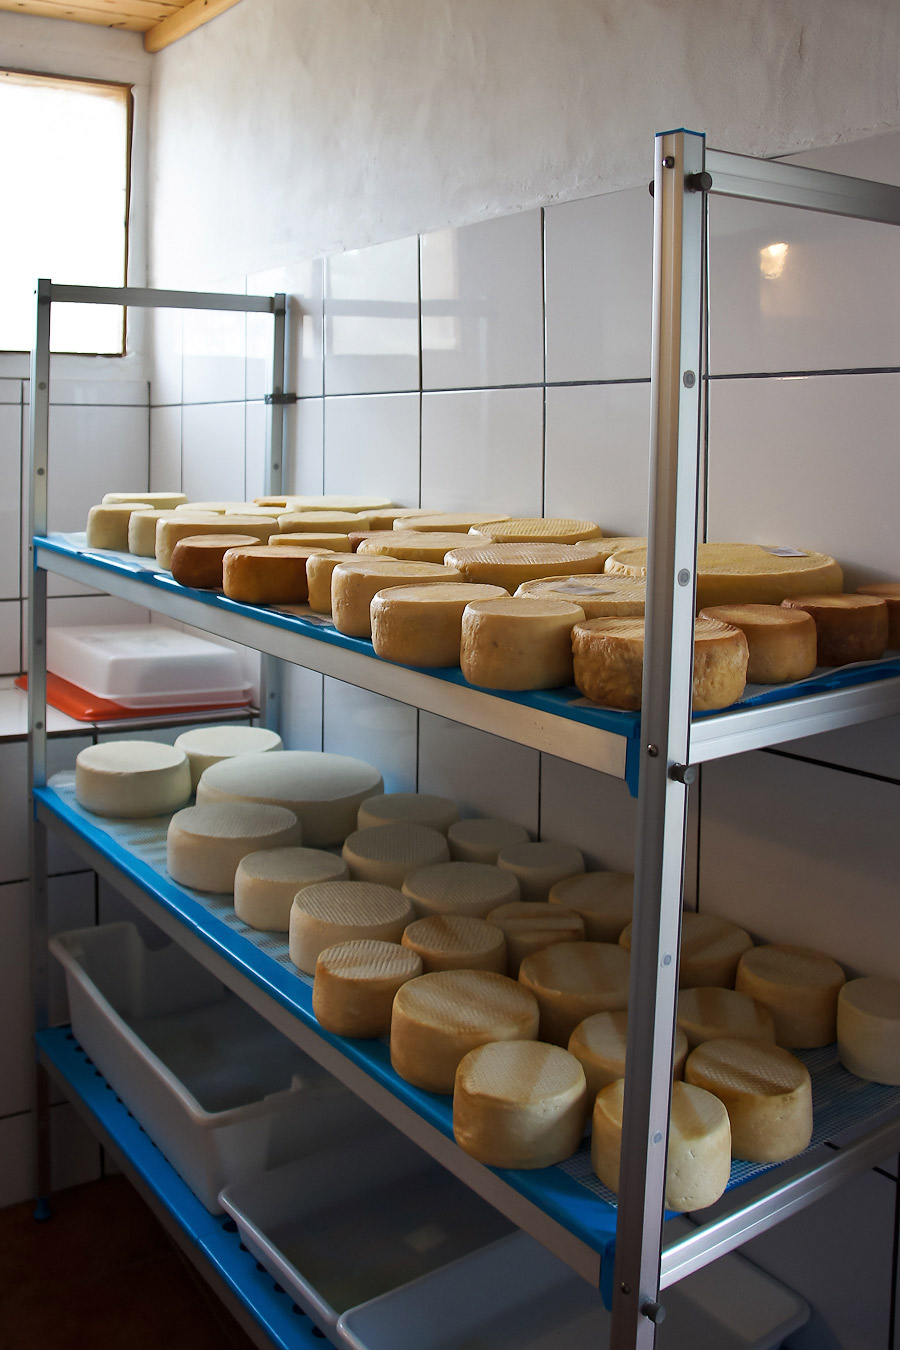 84.queso_doris-06990